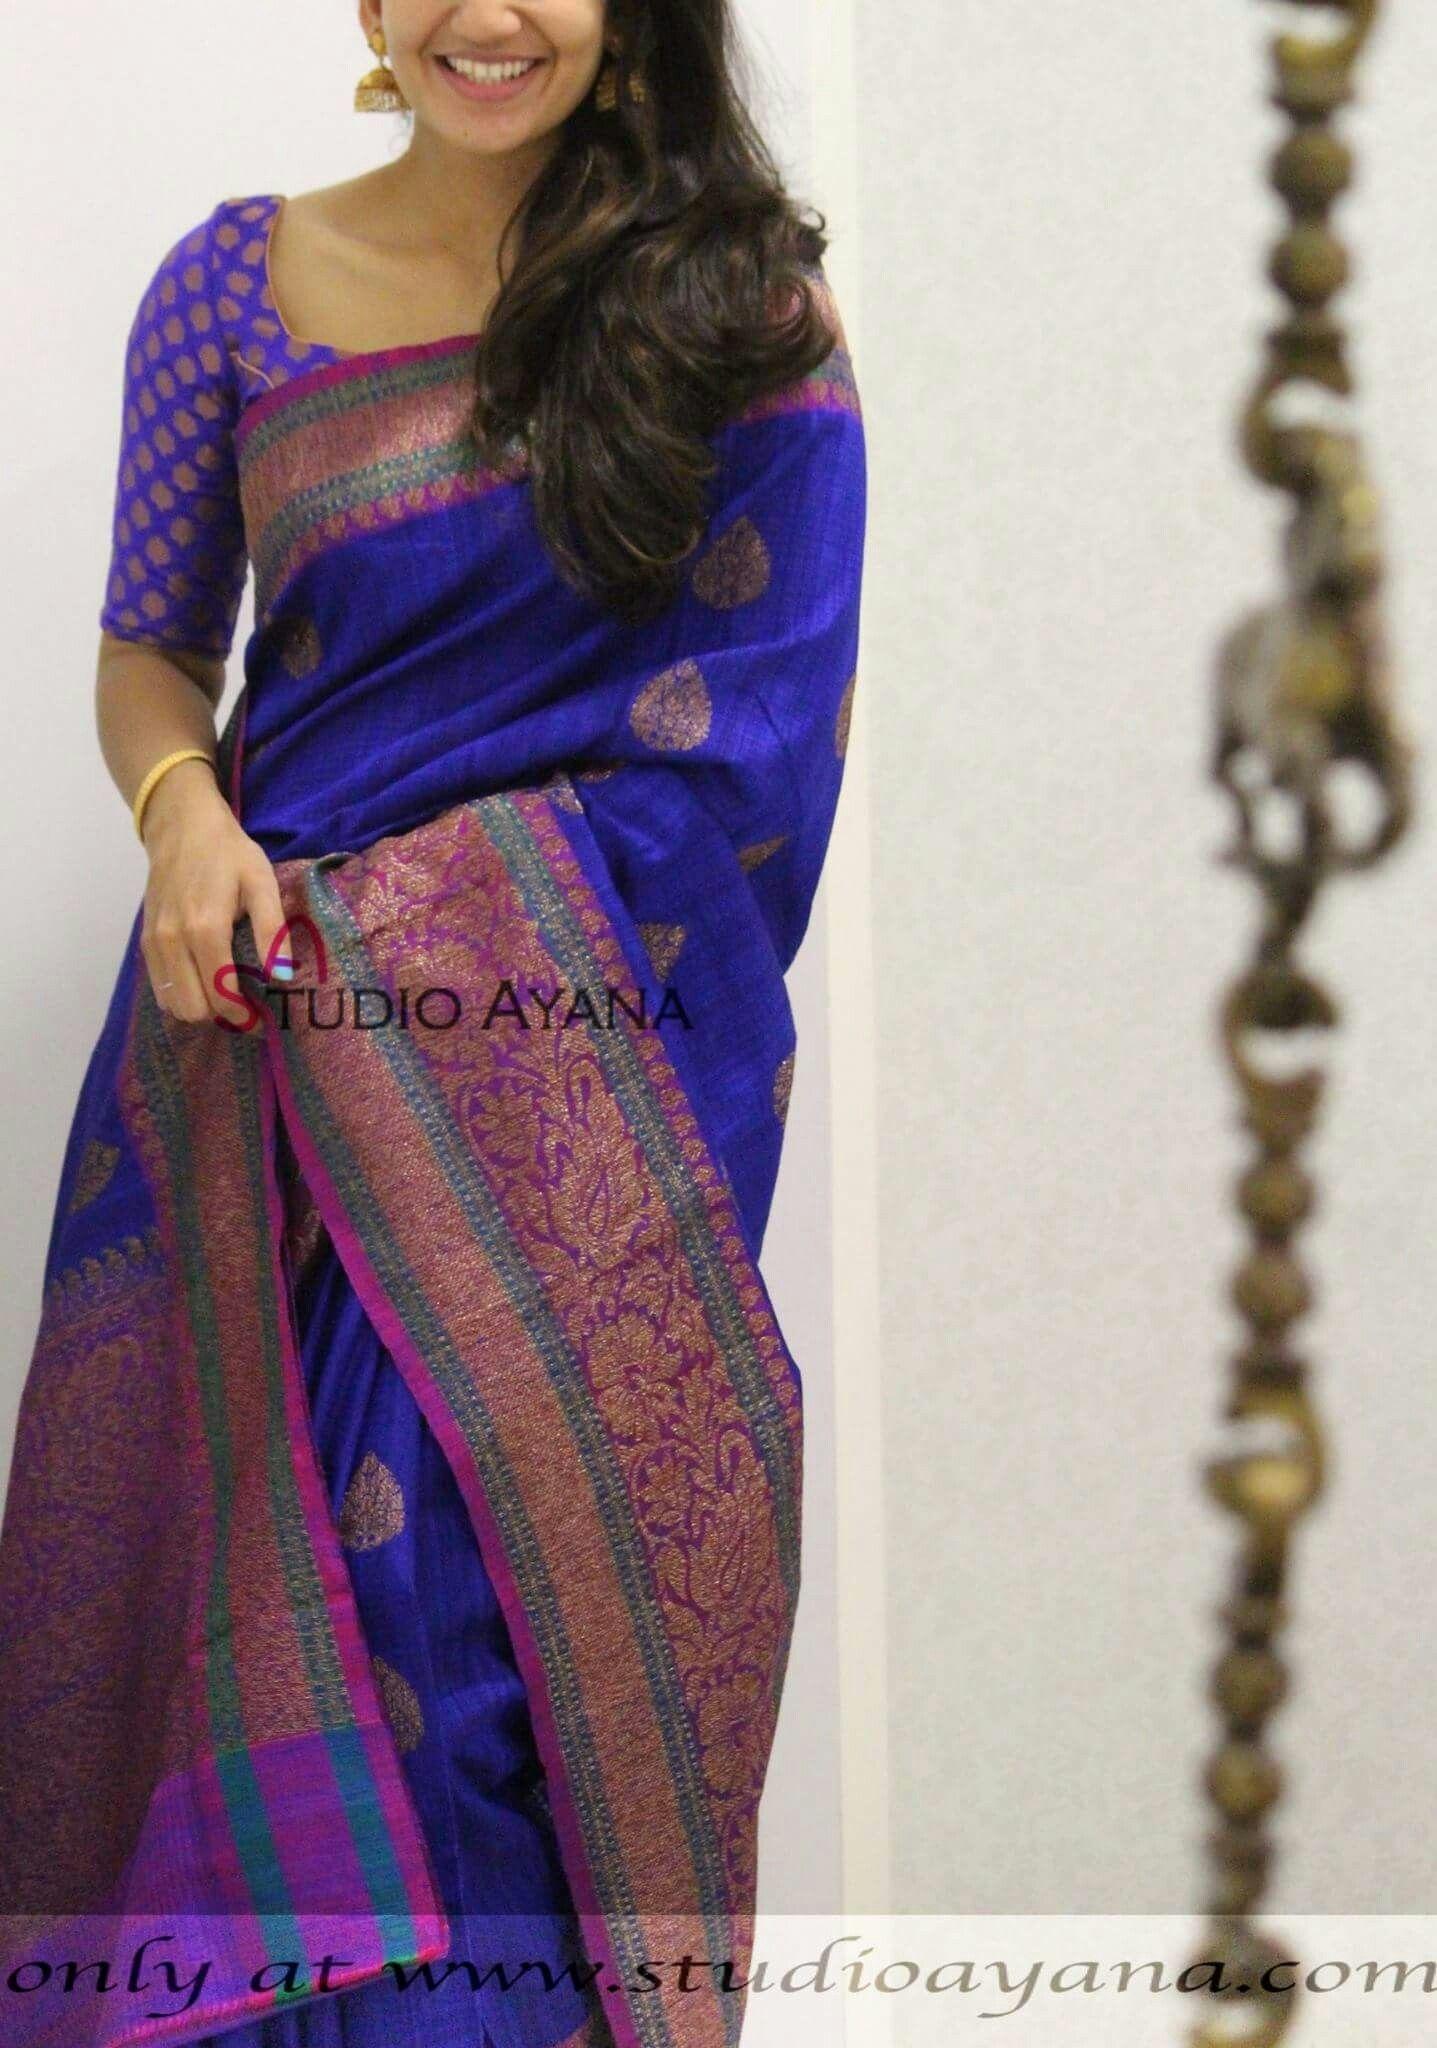 Pin de Kavvya Chandrashekar en Saree My style | Pinterest